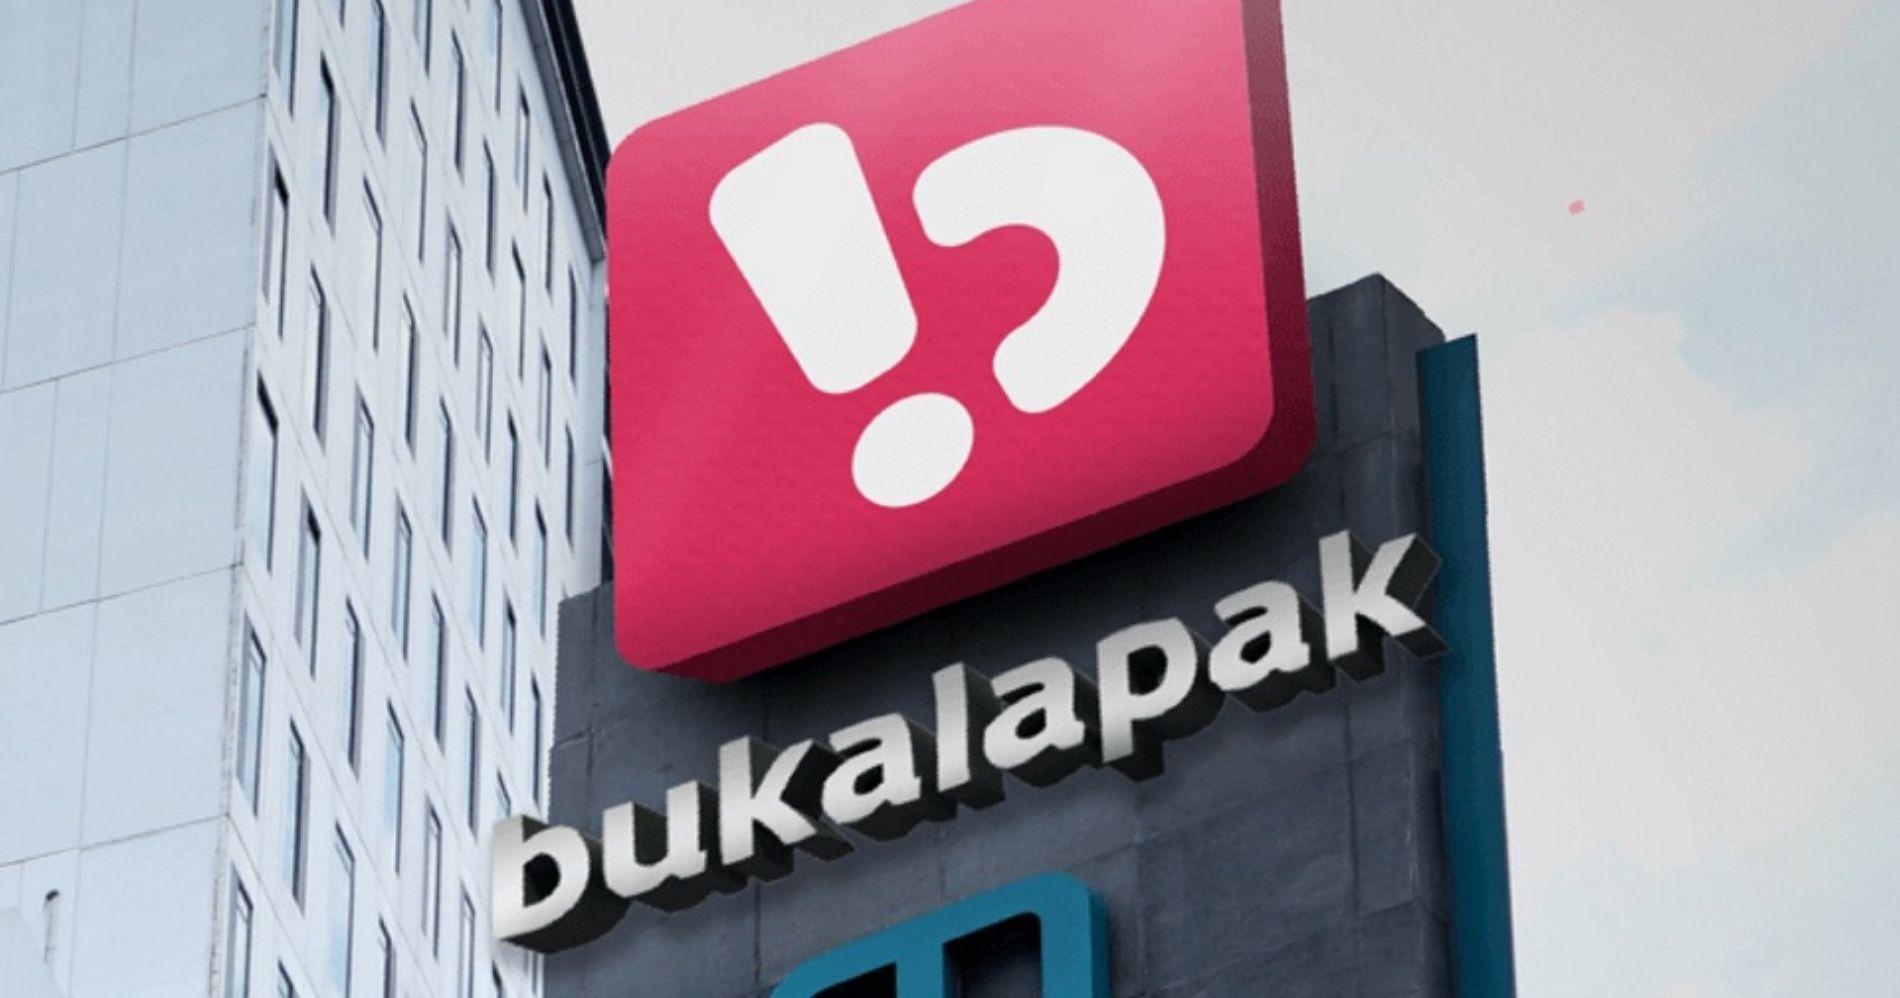 Buy or Bye Saham Bukalapak (BUKA) Illustration Bisnis Muda - Image: Wikimedia